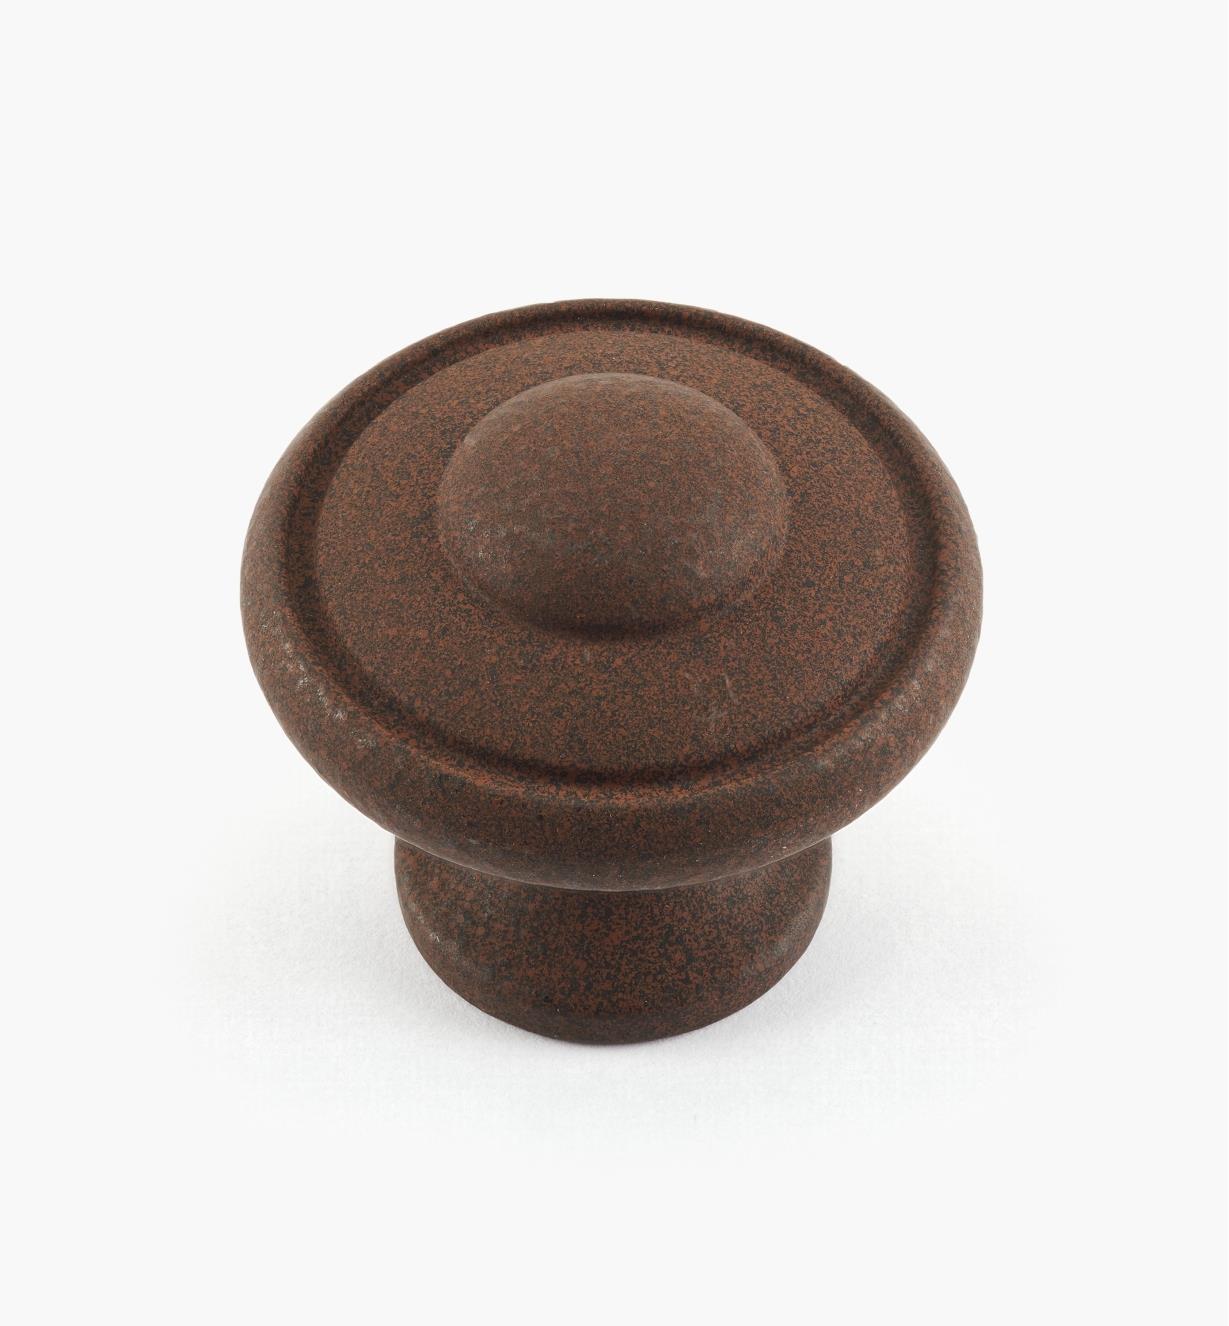 02G1851 - Dull Rust Knob